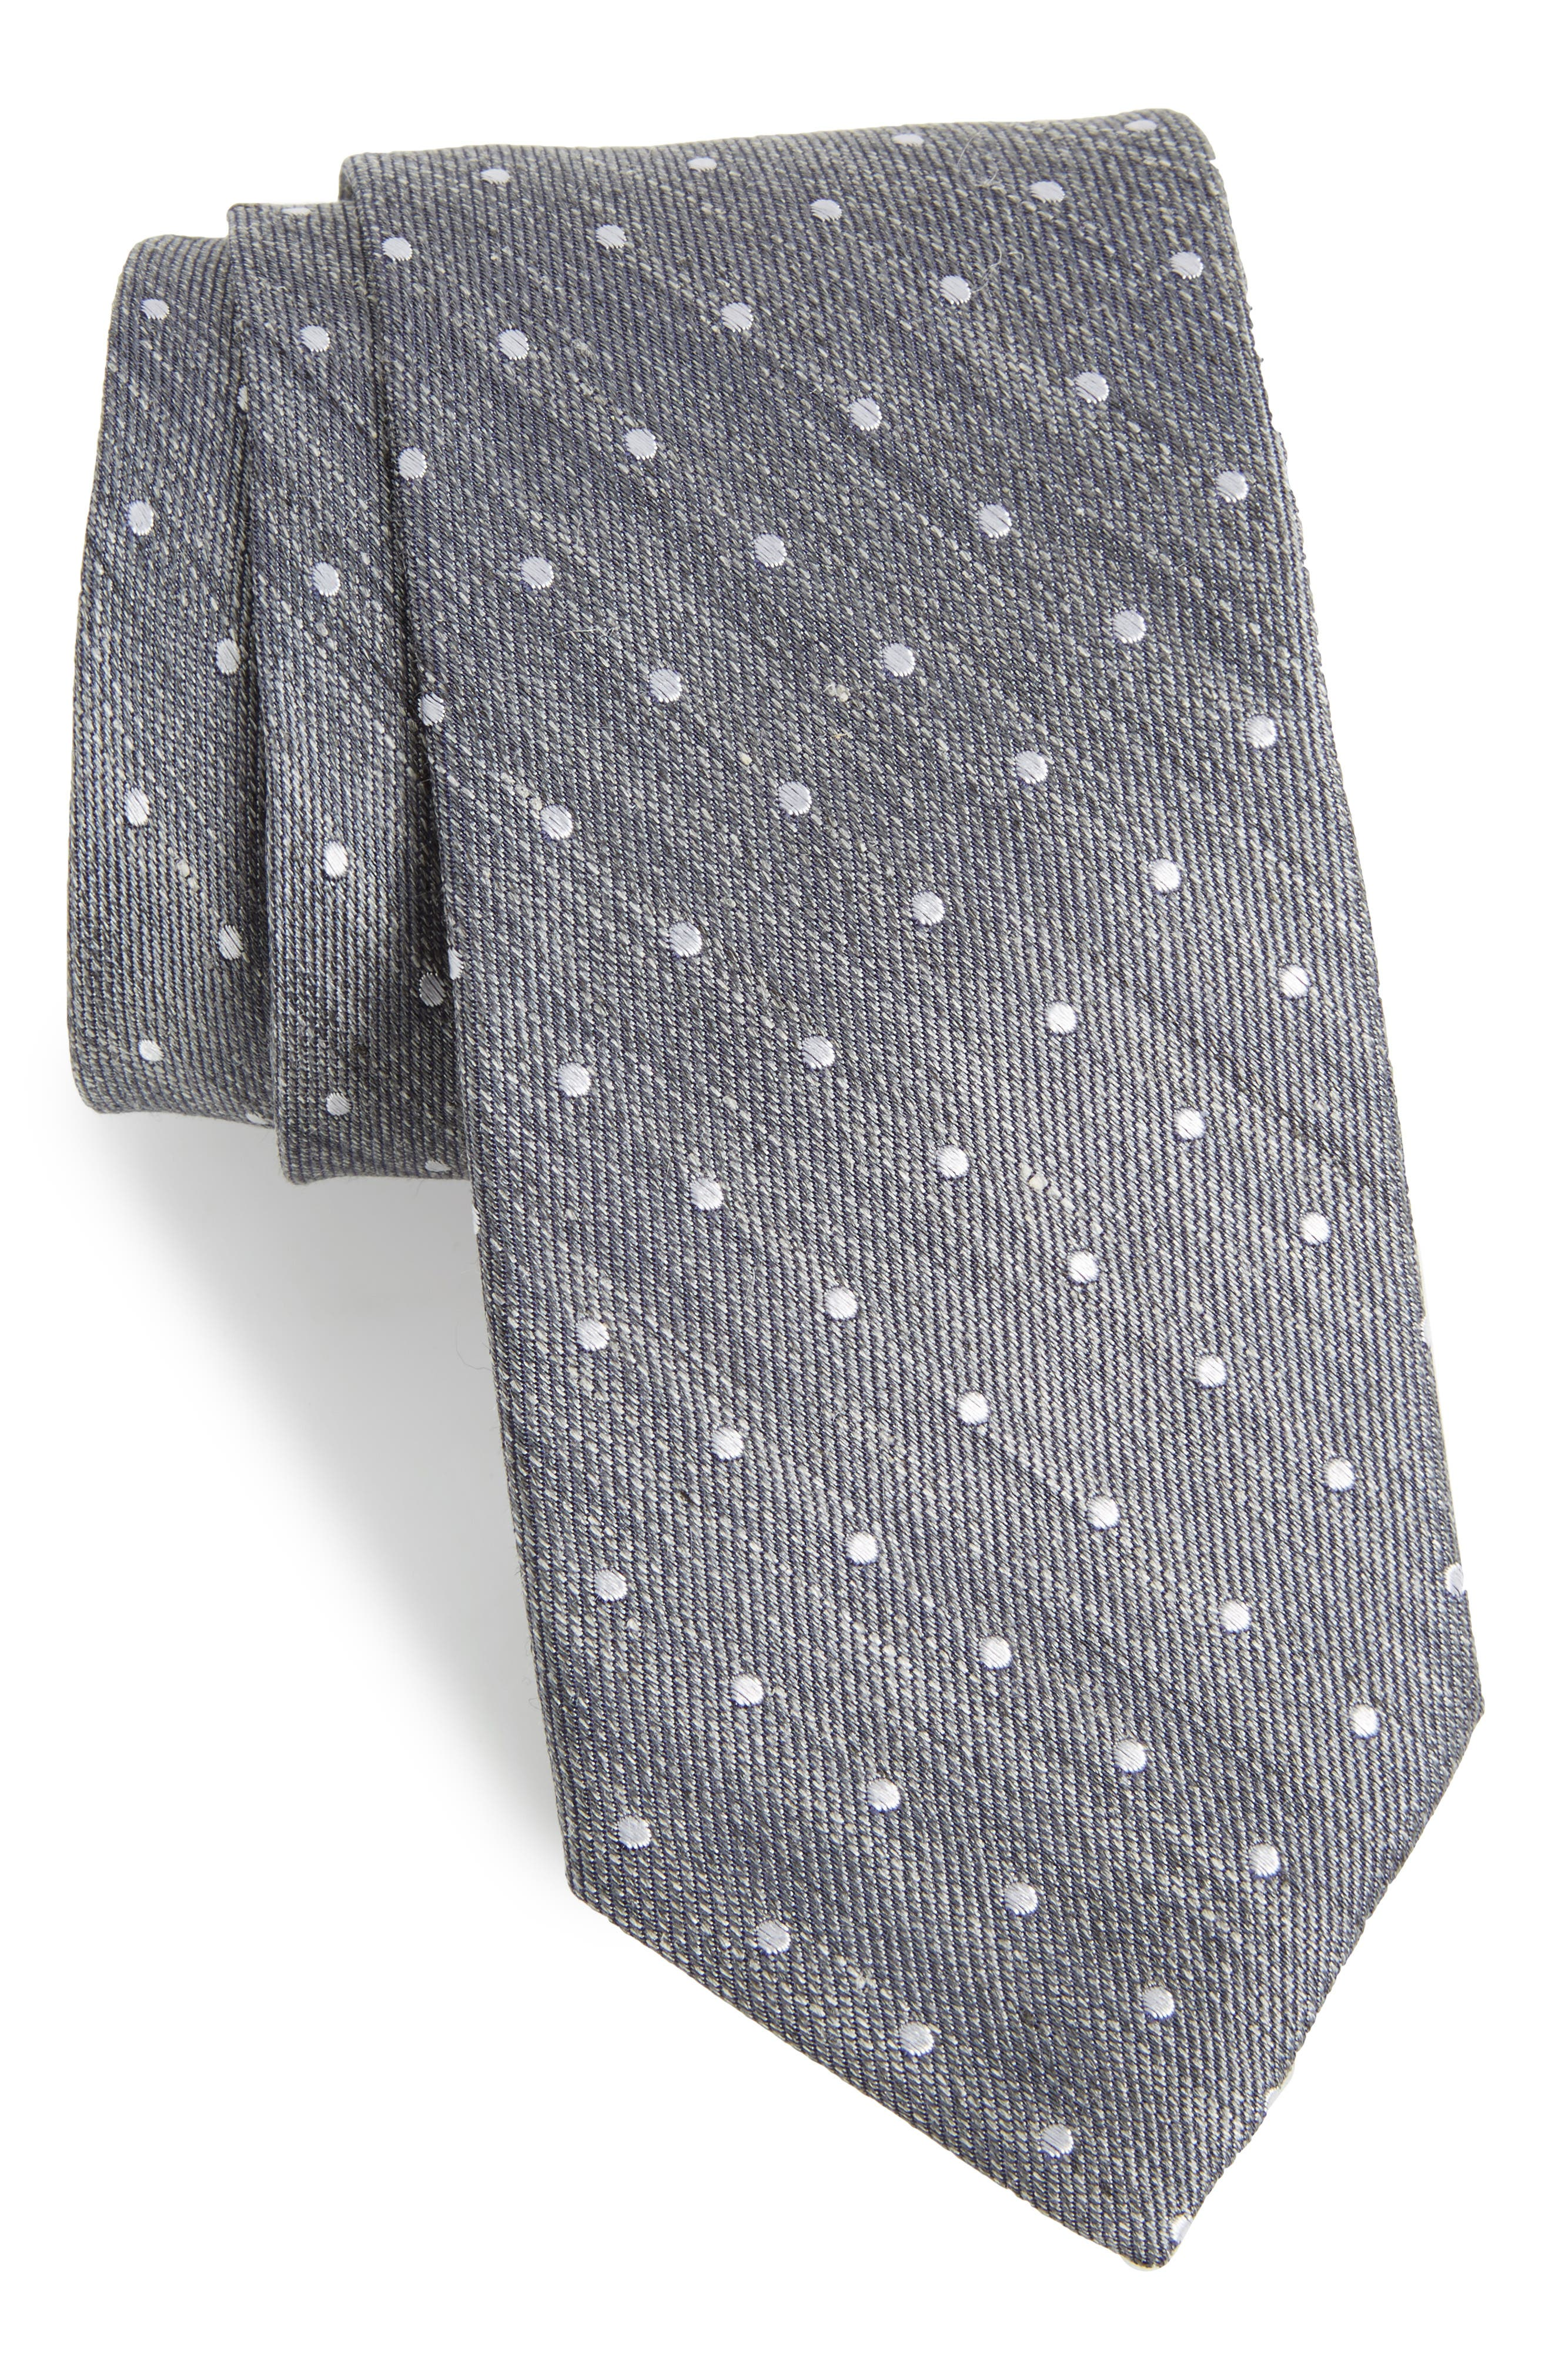 Alternate Image 1 Selected - Bonobos Dot Silk & Linen Tie